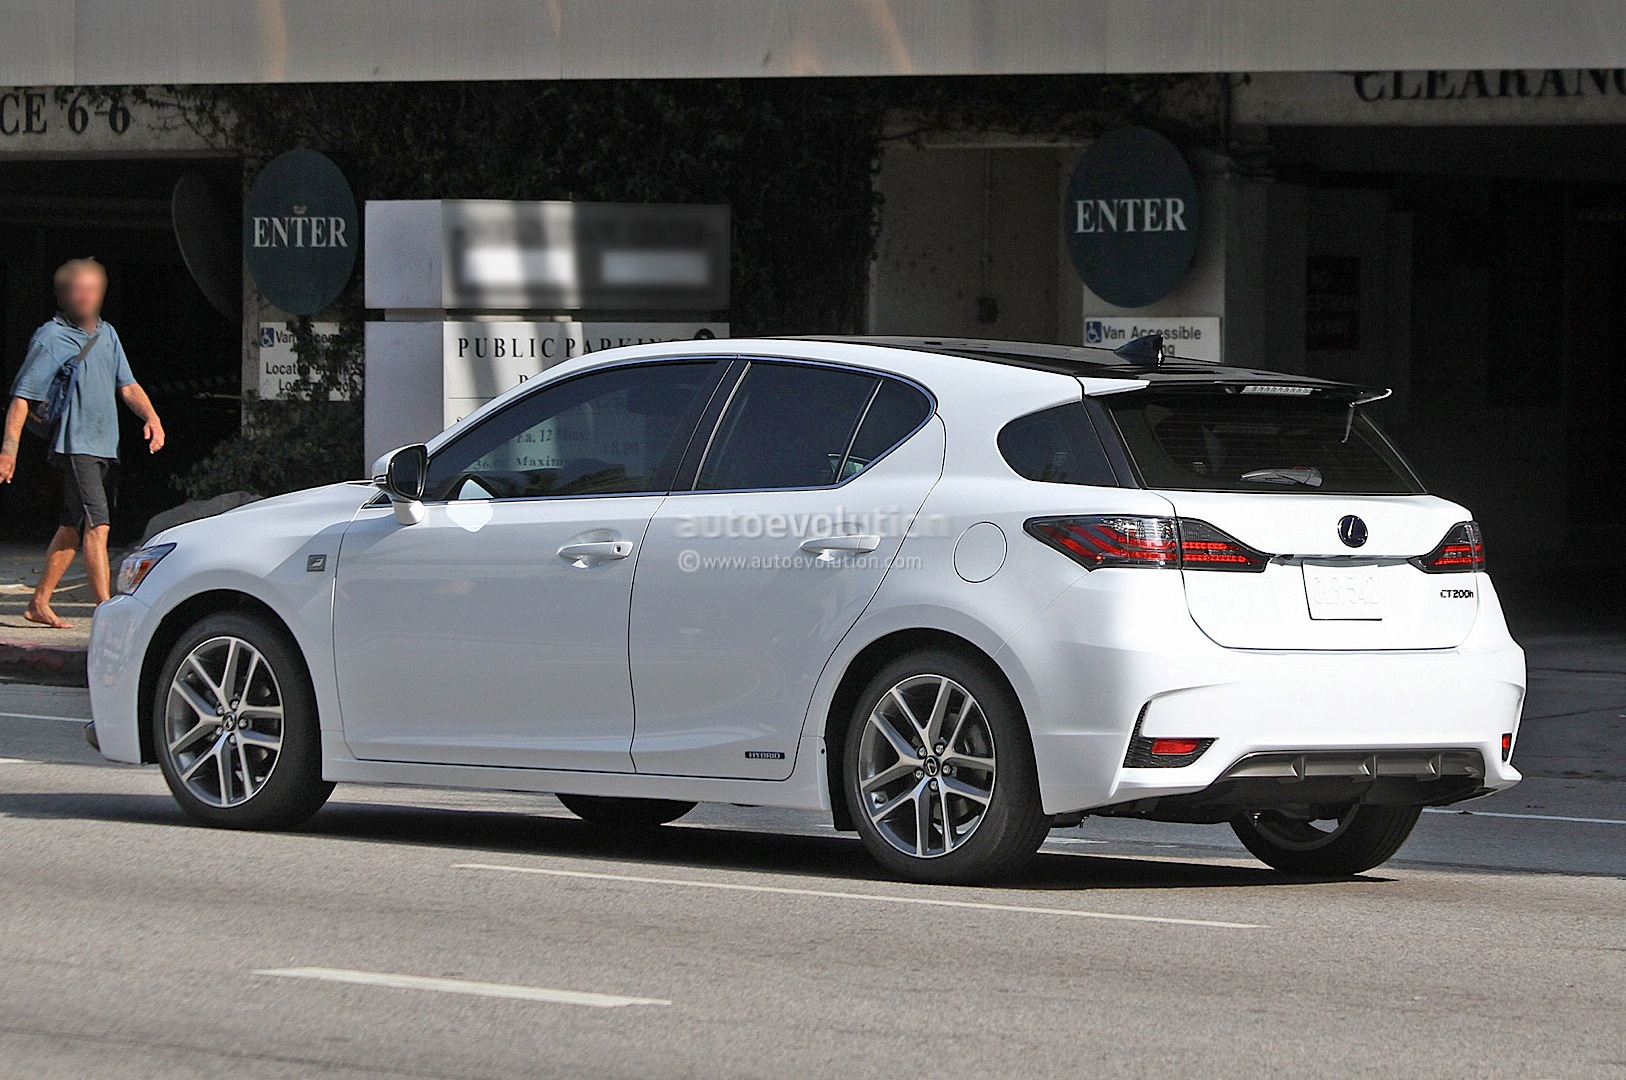 Spyshots: Lexus CT 200h F Sport Gets Spindle Grille ...